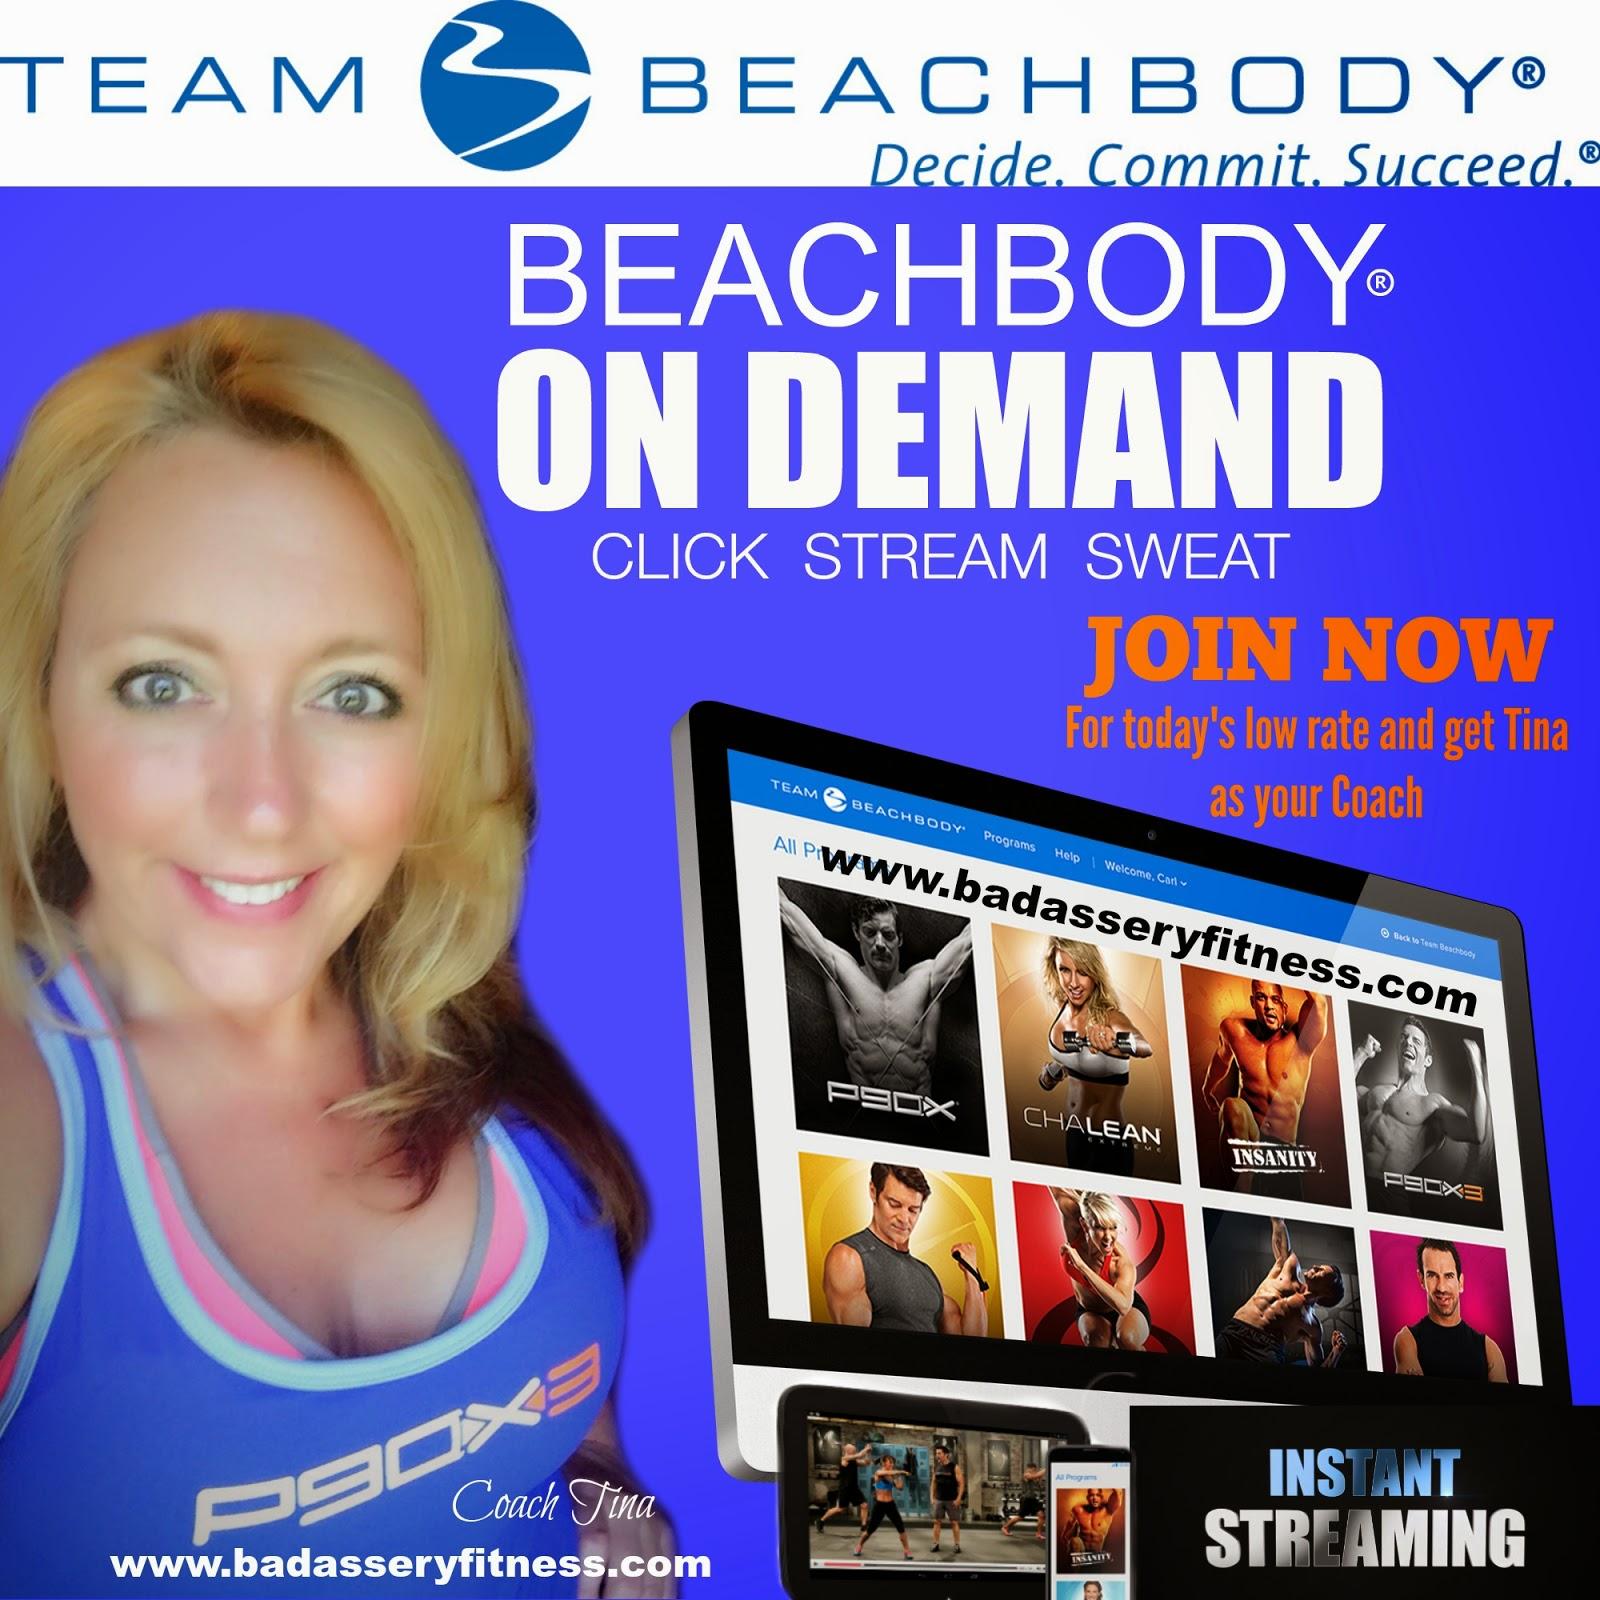 Badassery Fitness Beachbody On Demand